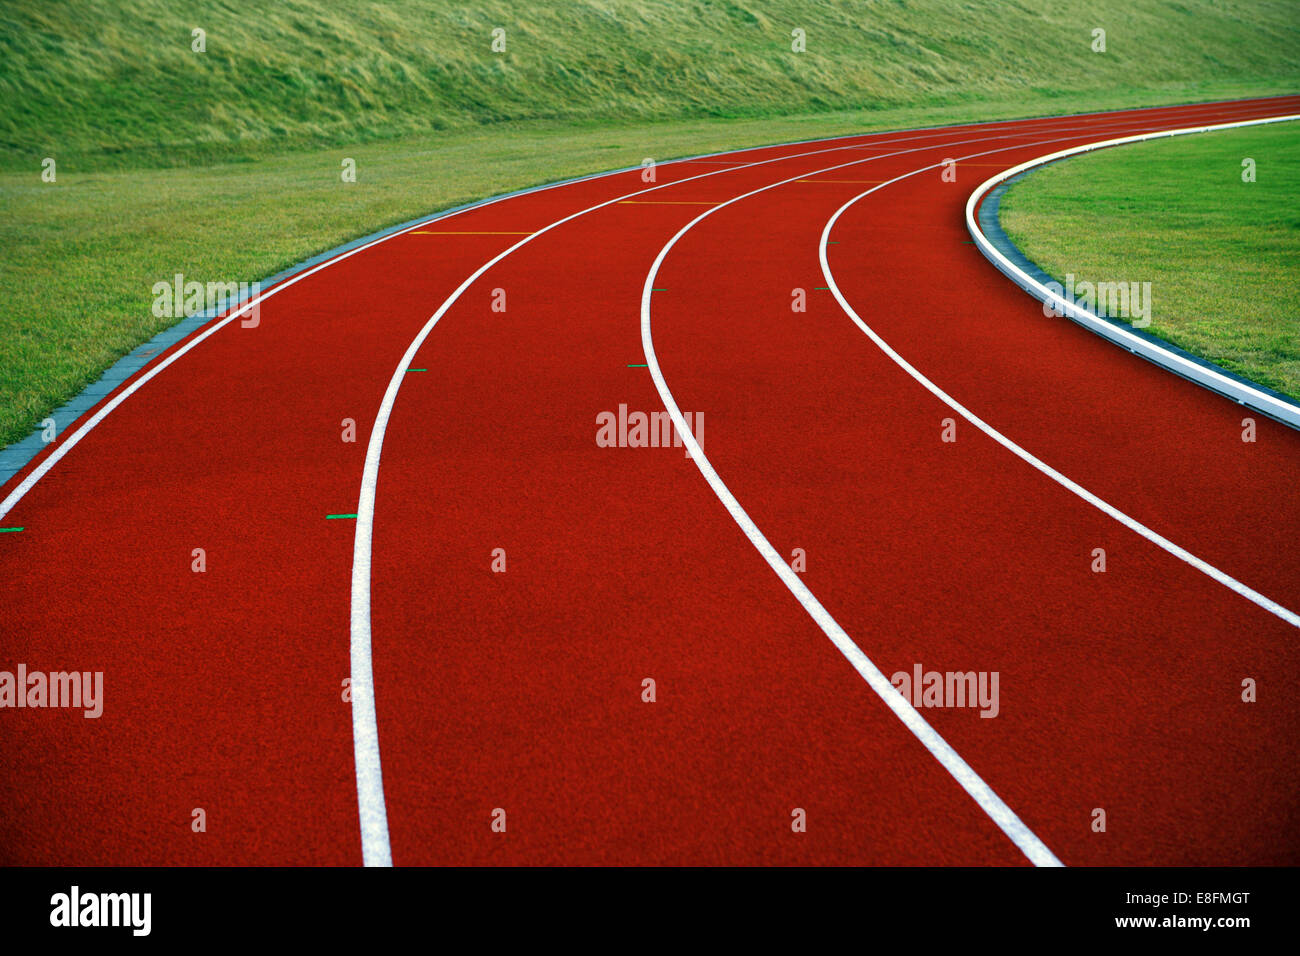 Nahaufnahme der Laufstrecke Stockbild